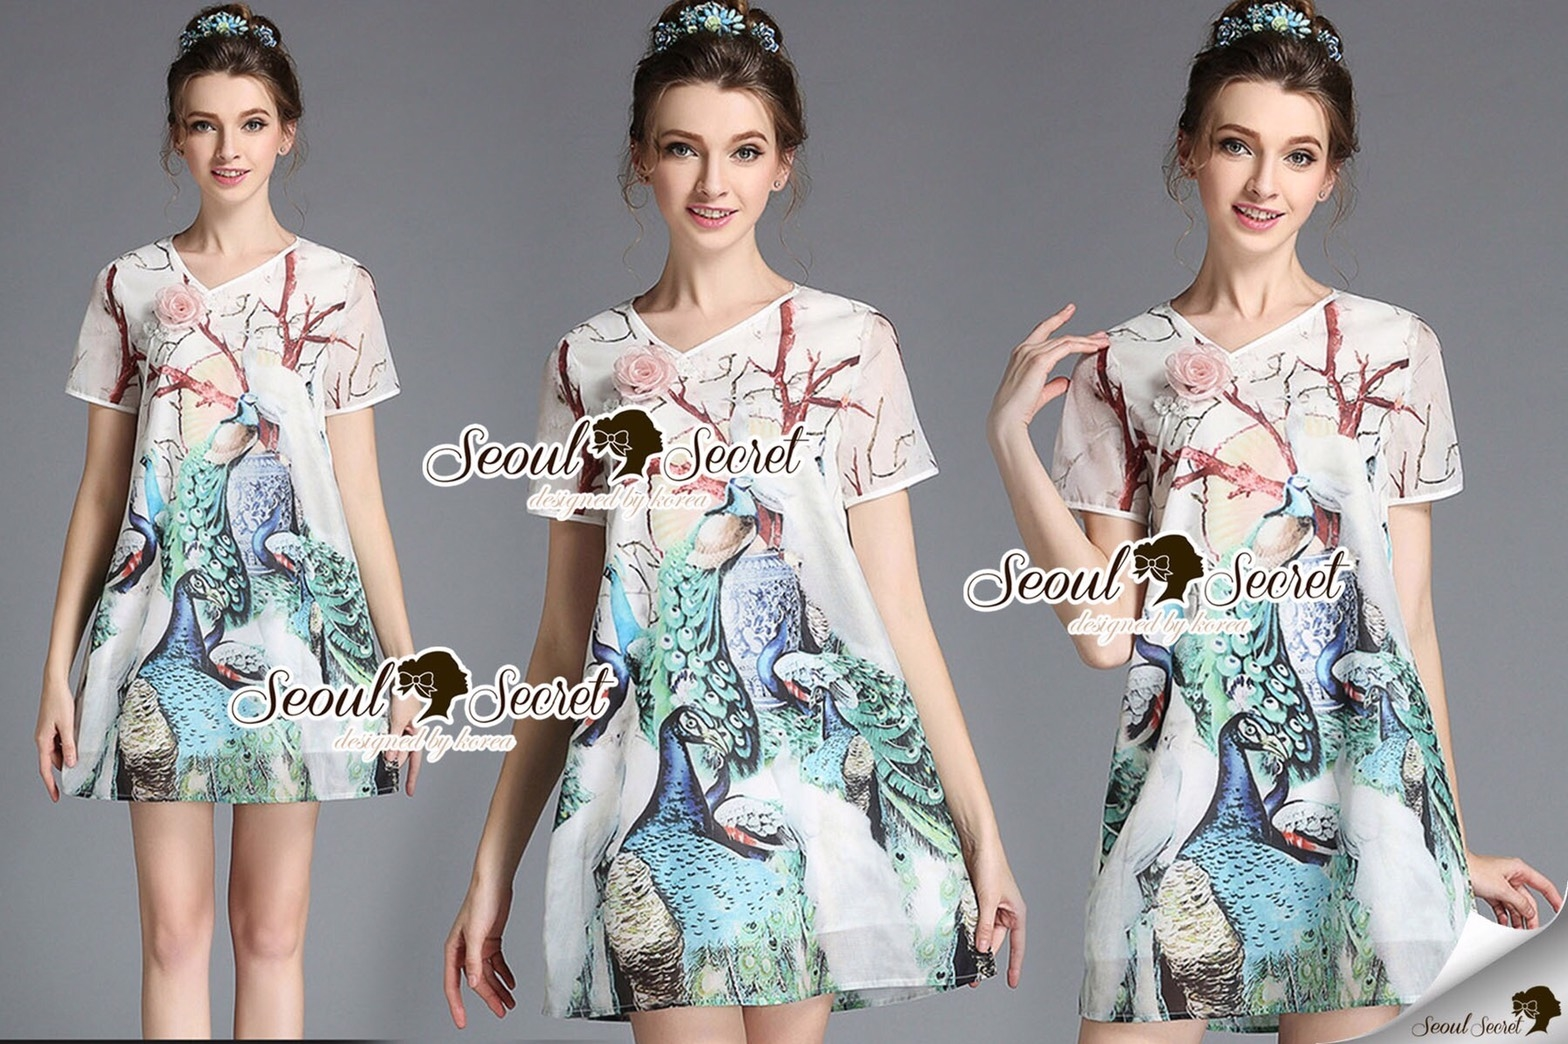 Seoul Secret Say's... Peafowl Saphire Tonely Printed Dress